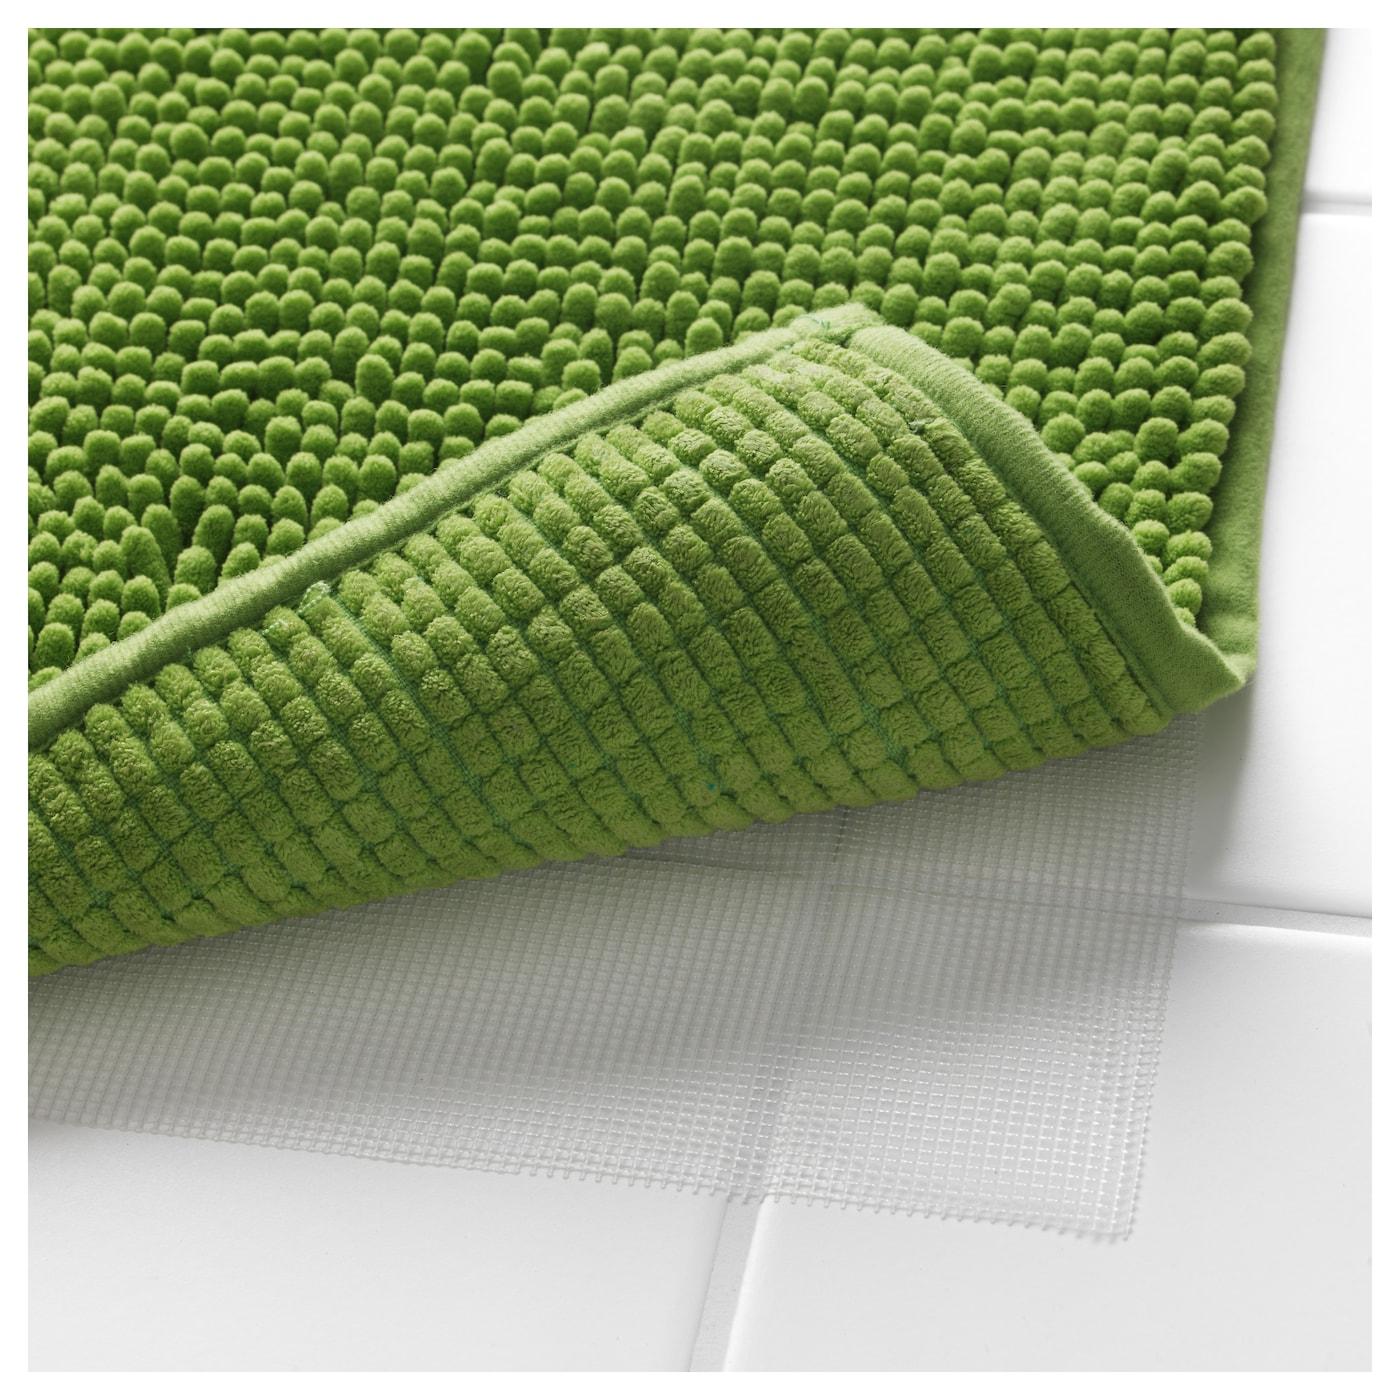 toftbo bath mat green 60 x 90 cm ikea. Black Bedroom Furniture Sets. Home Design Ideas